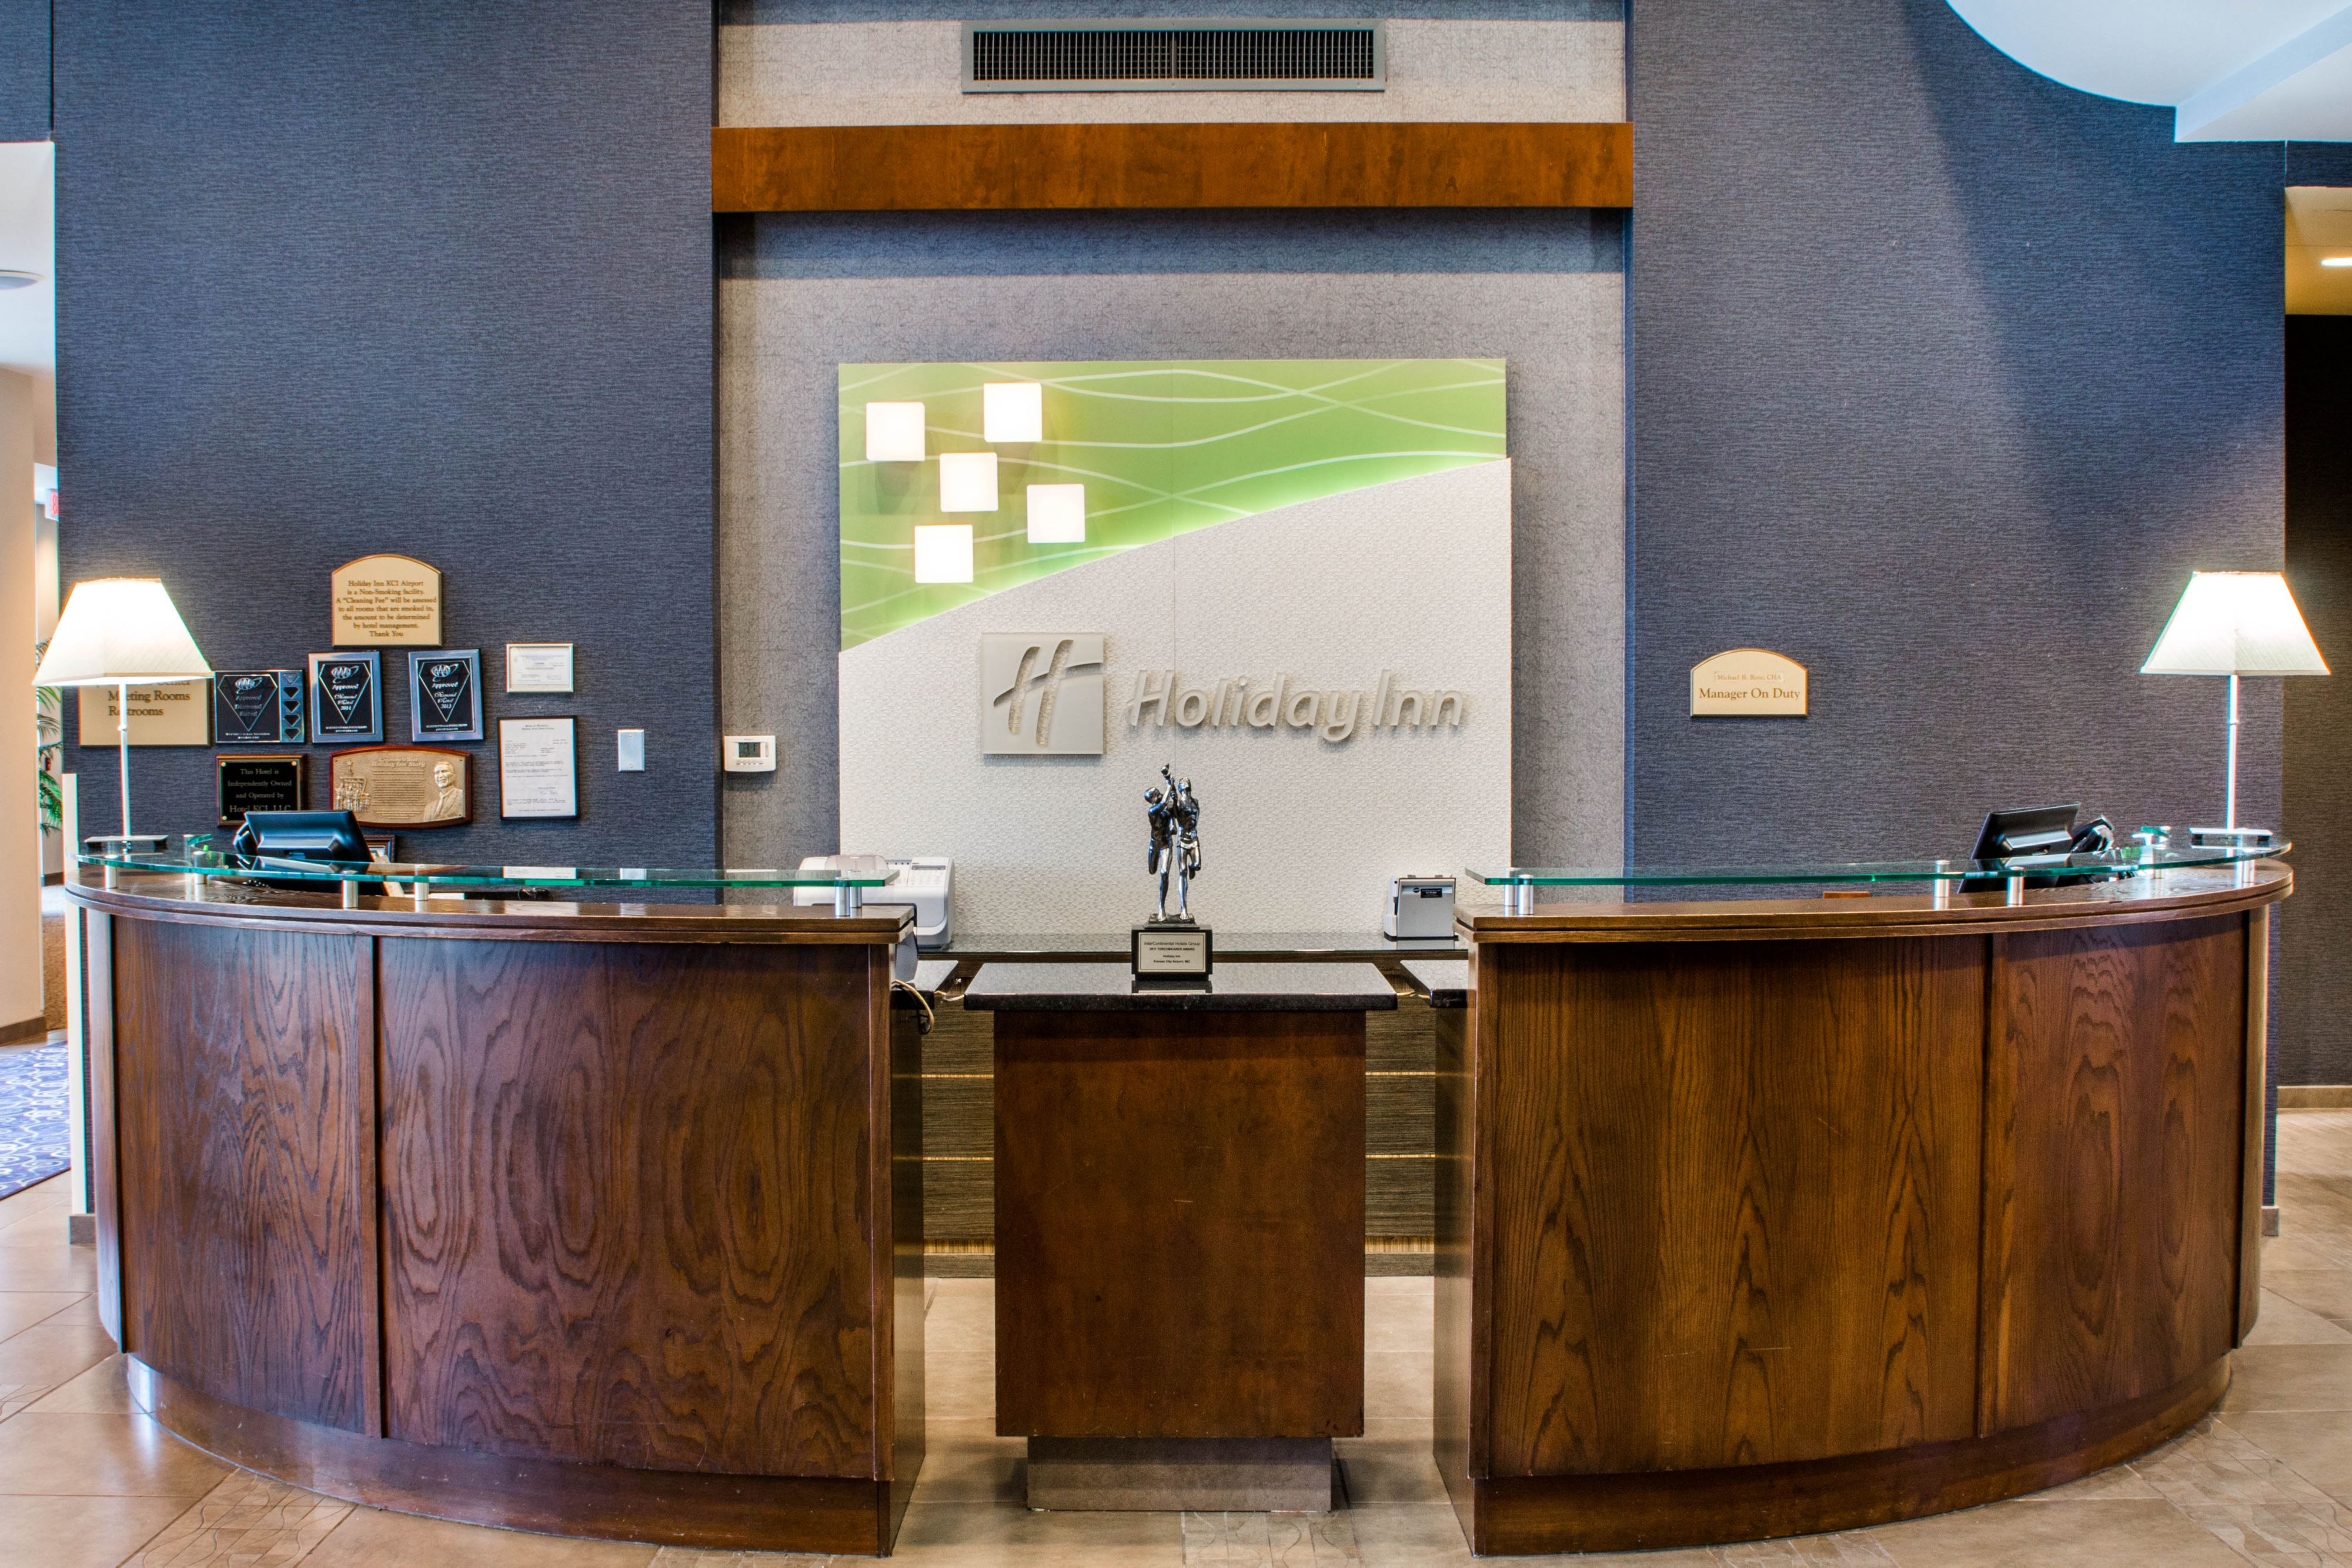 Holiday Inn Kansas City Airport image 6